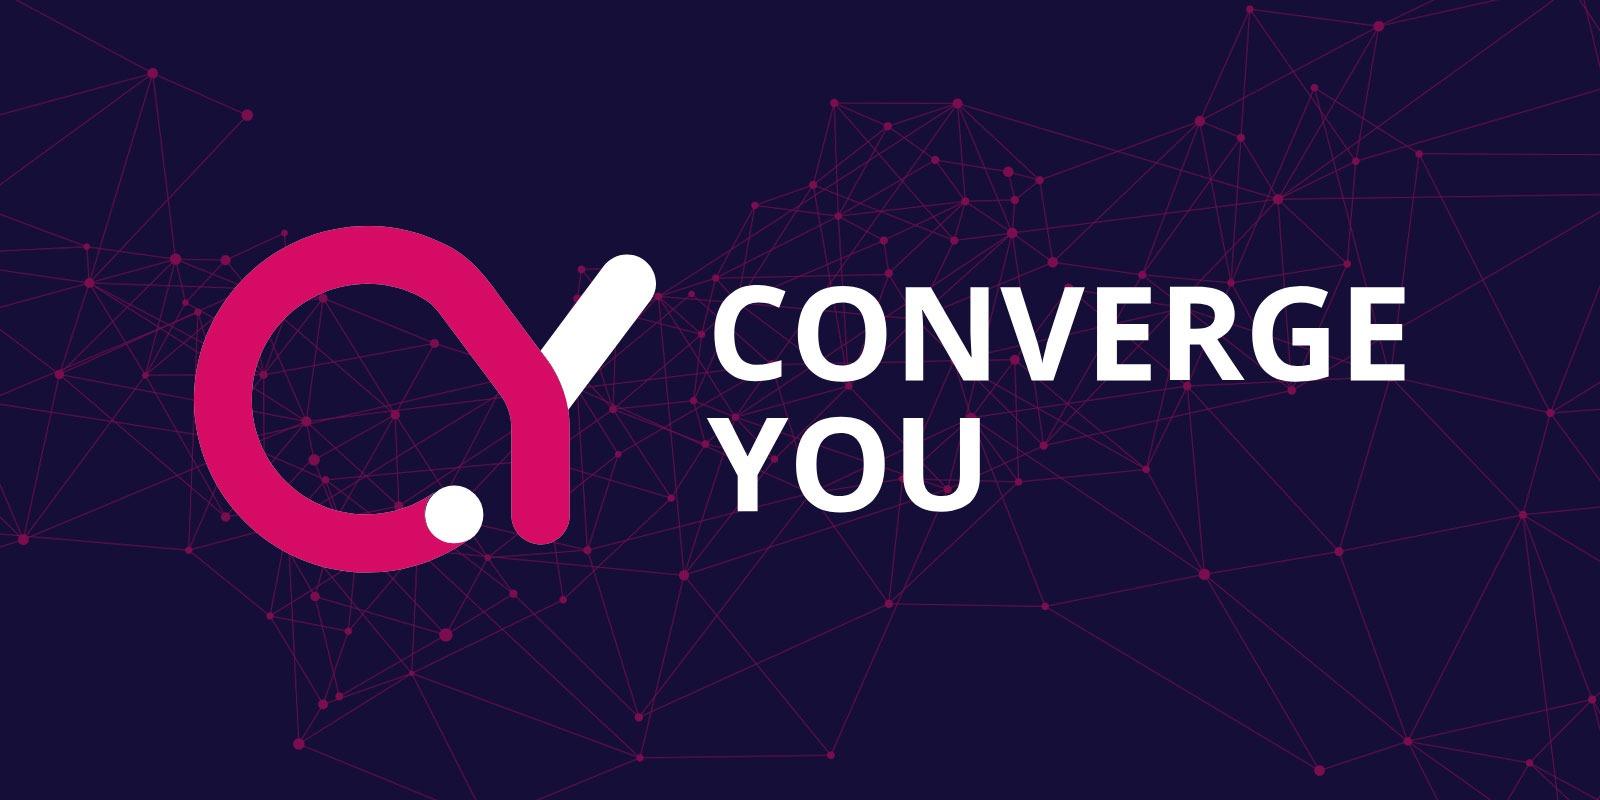 Converge You